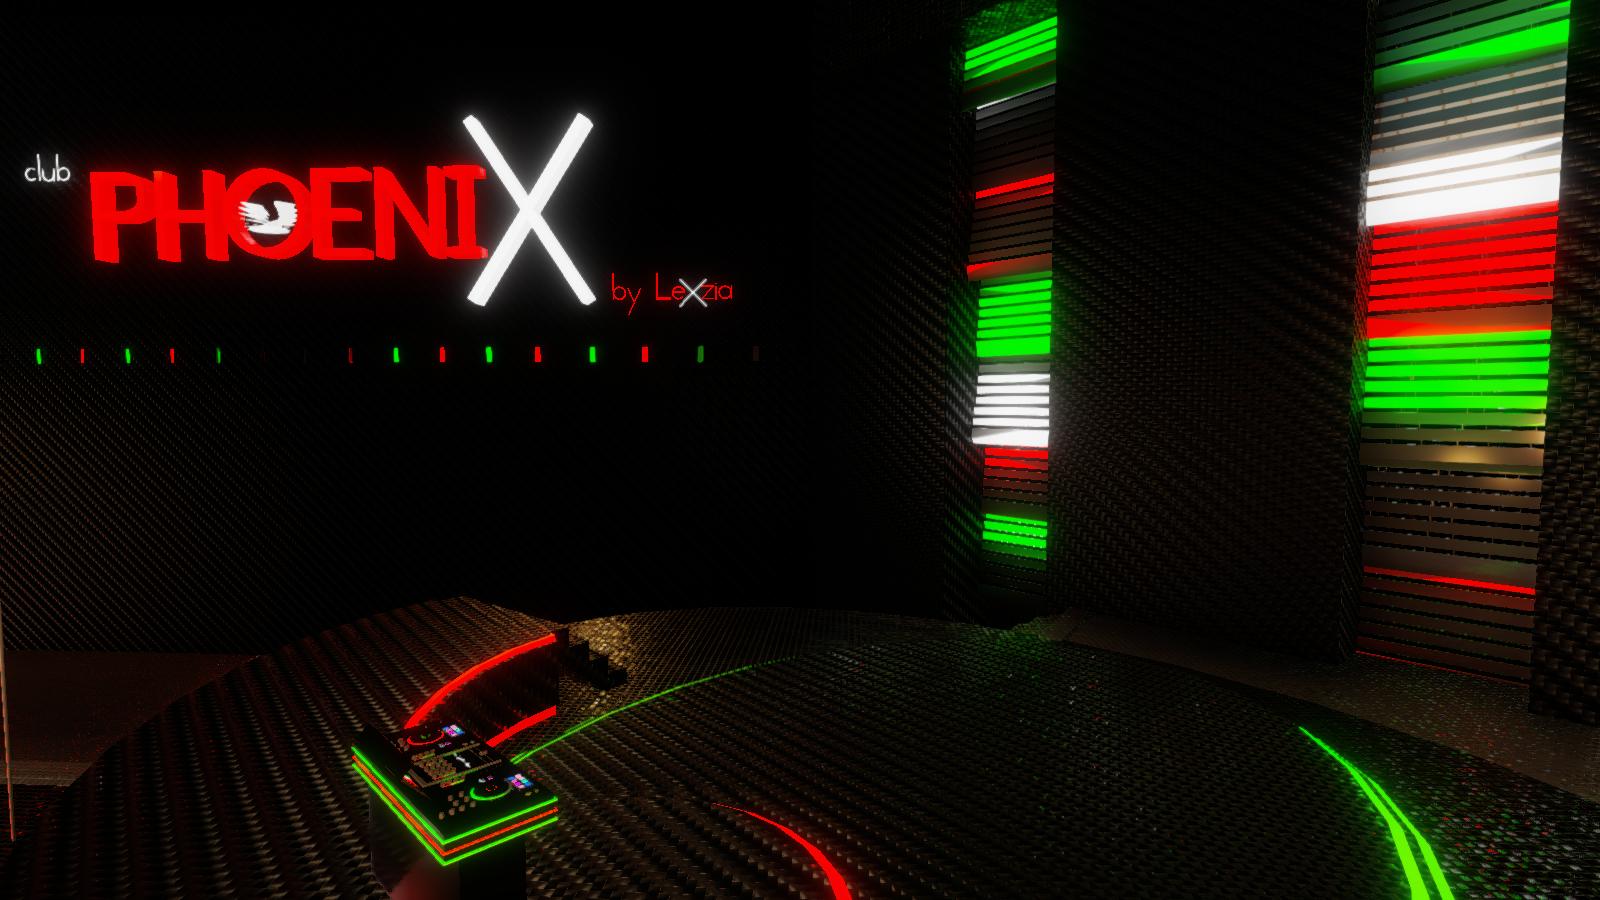 Club Phoenix 03